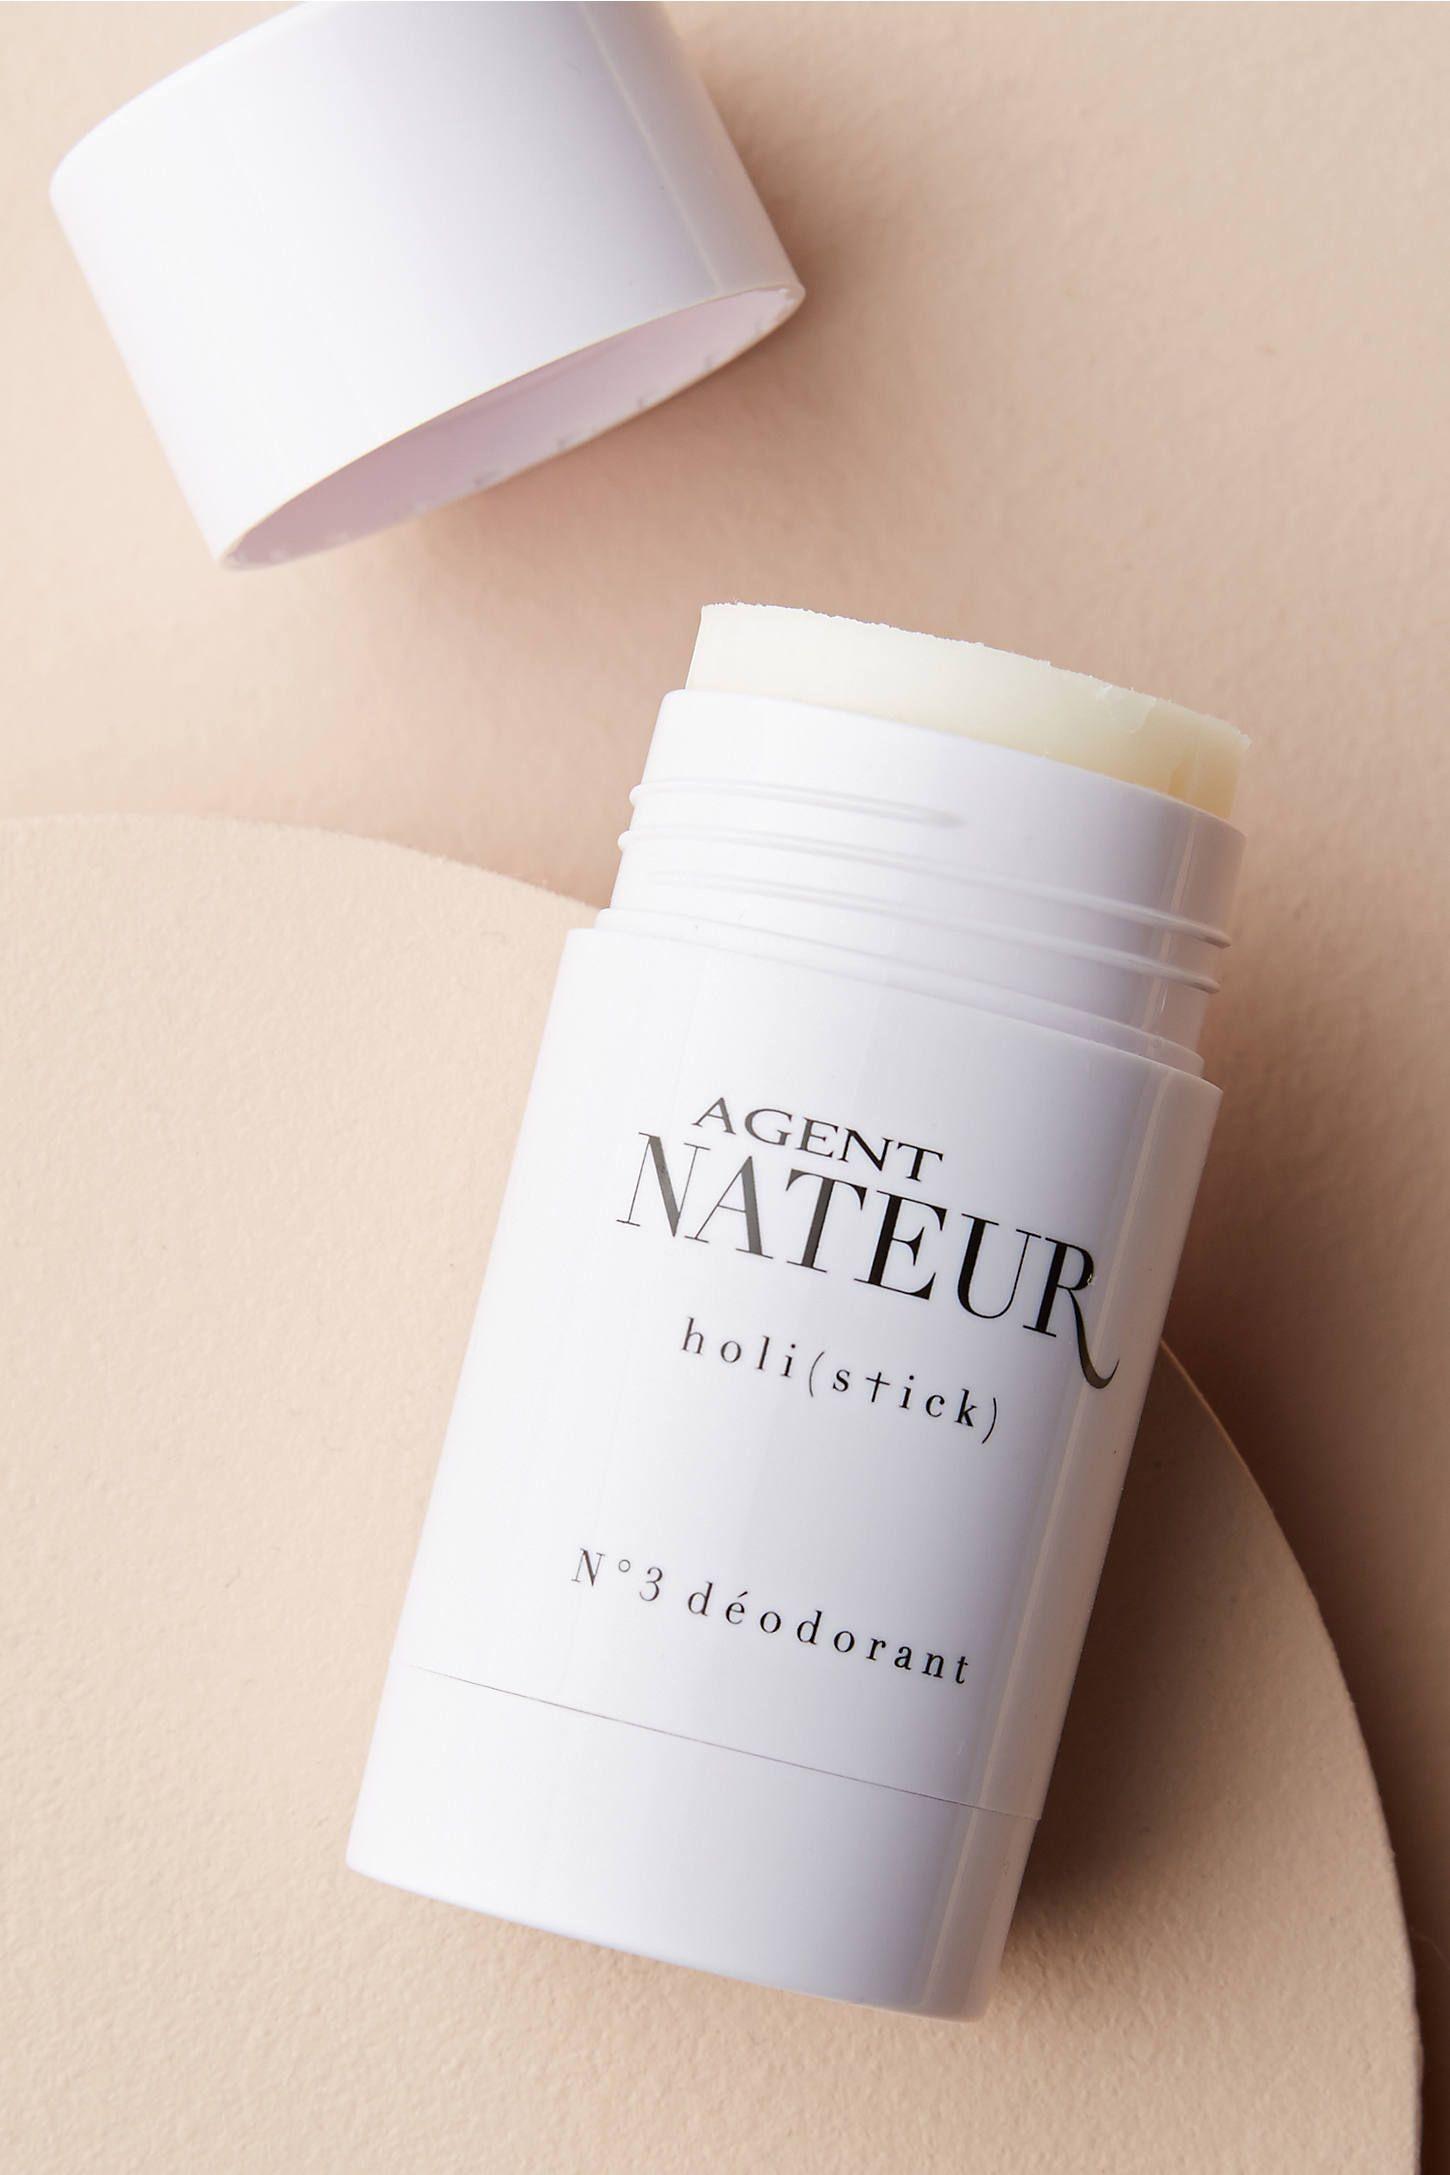 Agent Nateur Holi (Stick) No. 3 Deodorant Deodorant